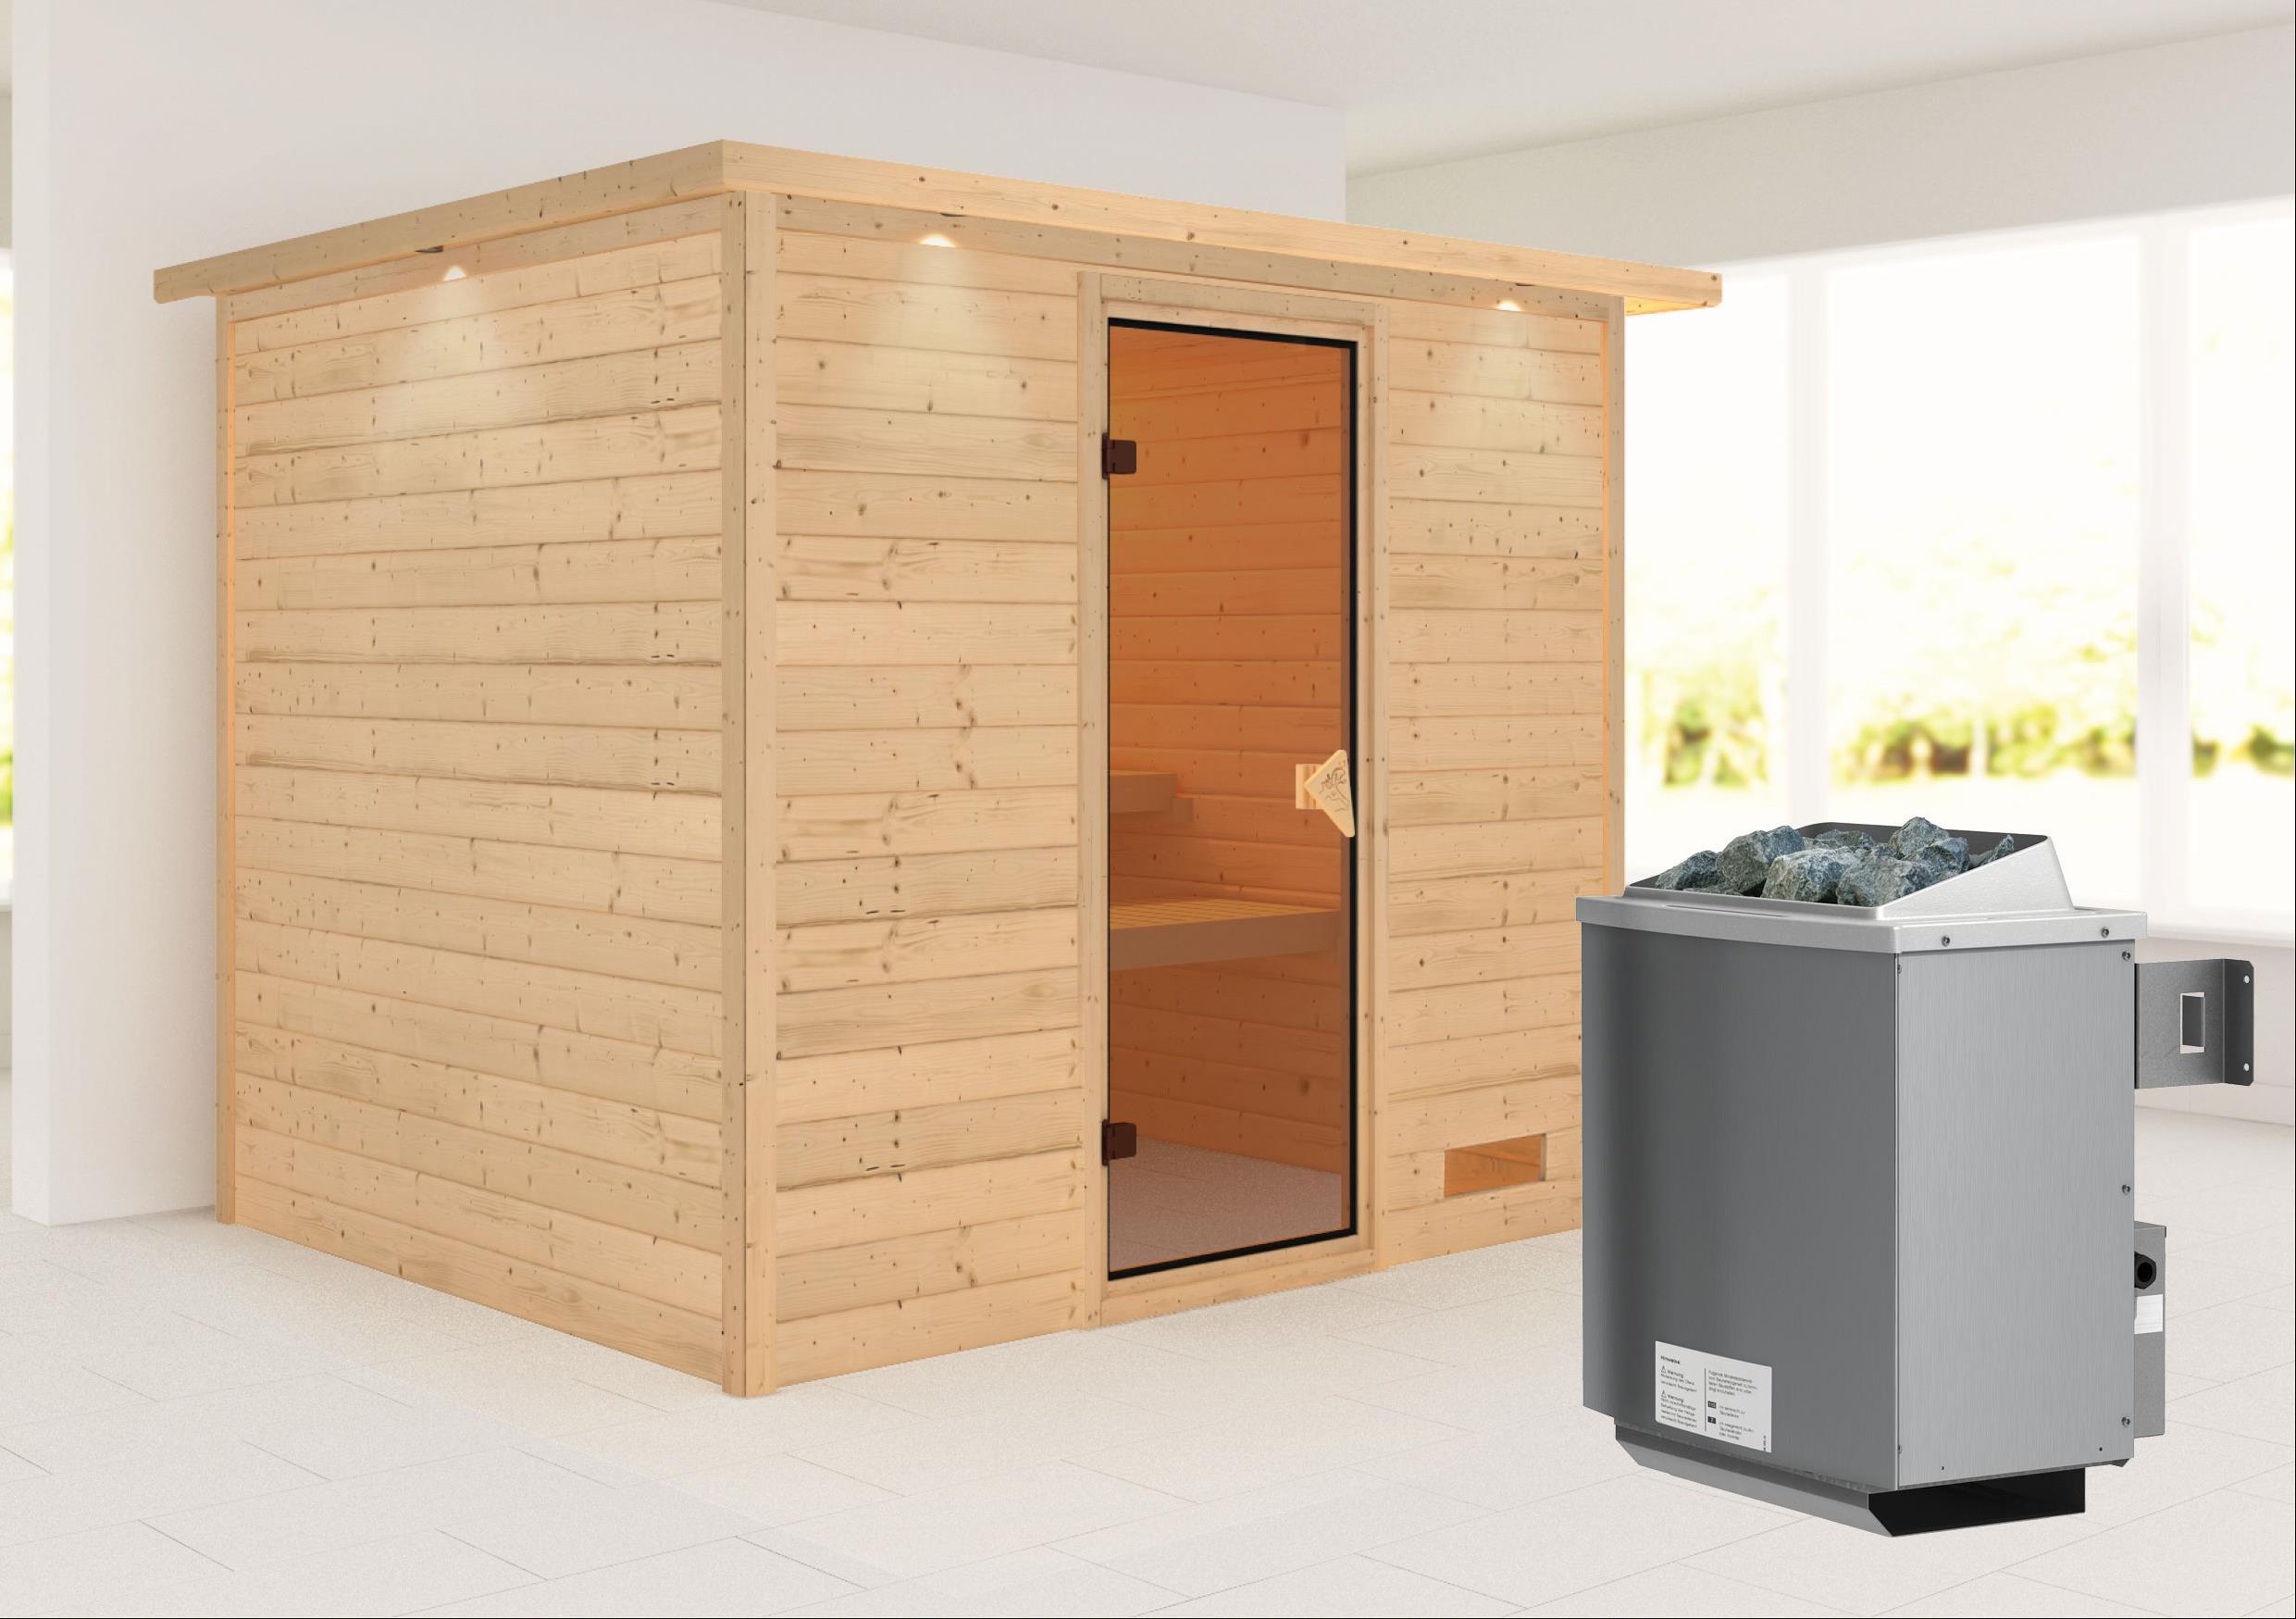 Woodfeeling Sauna Karla 38mm Kranz Ofen 9kW intern Tür Classic Bild 1